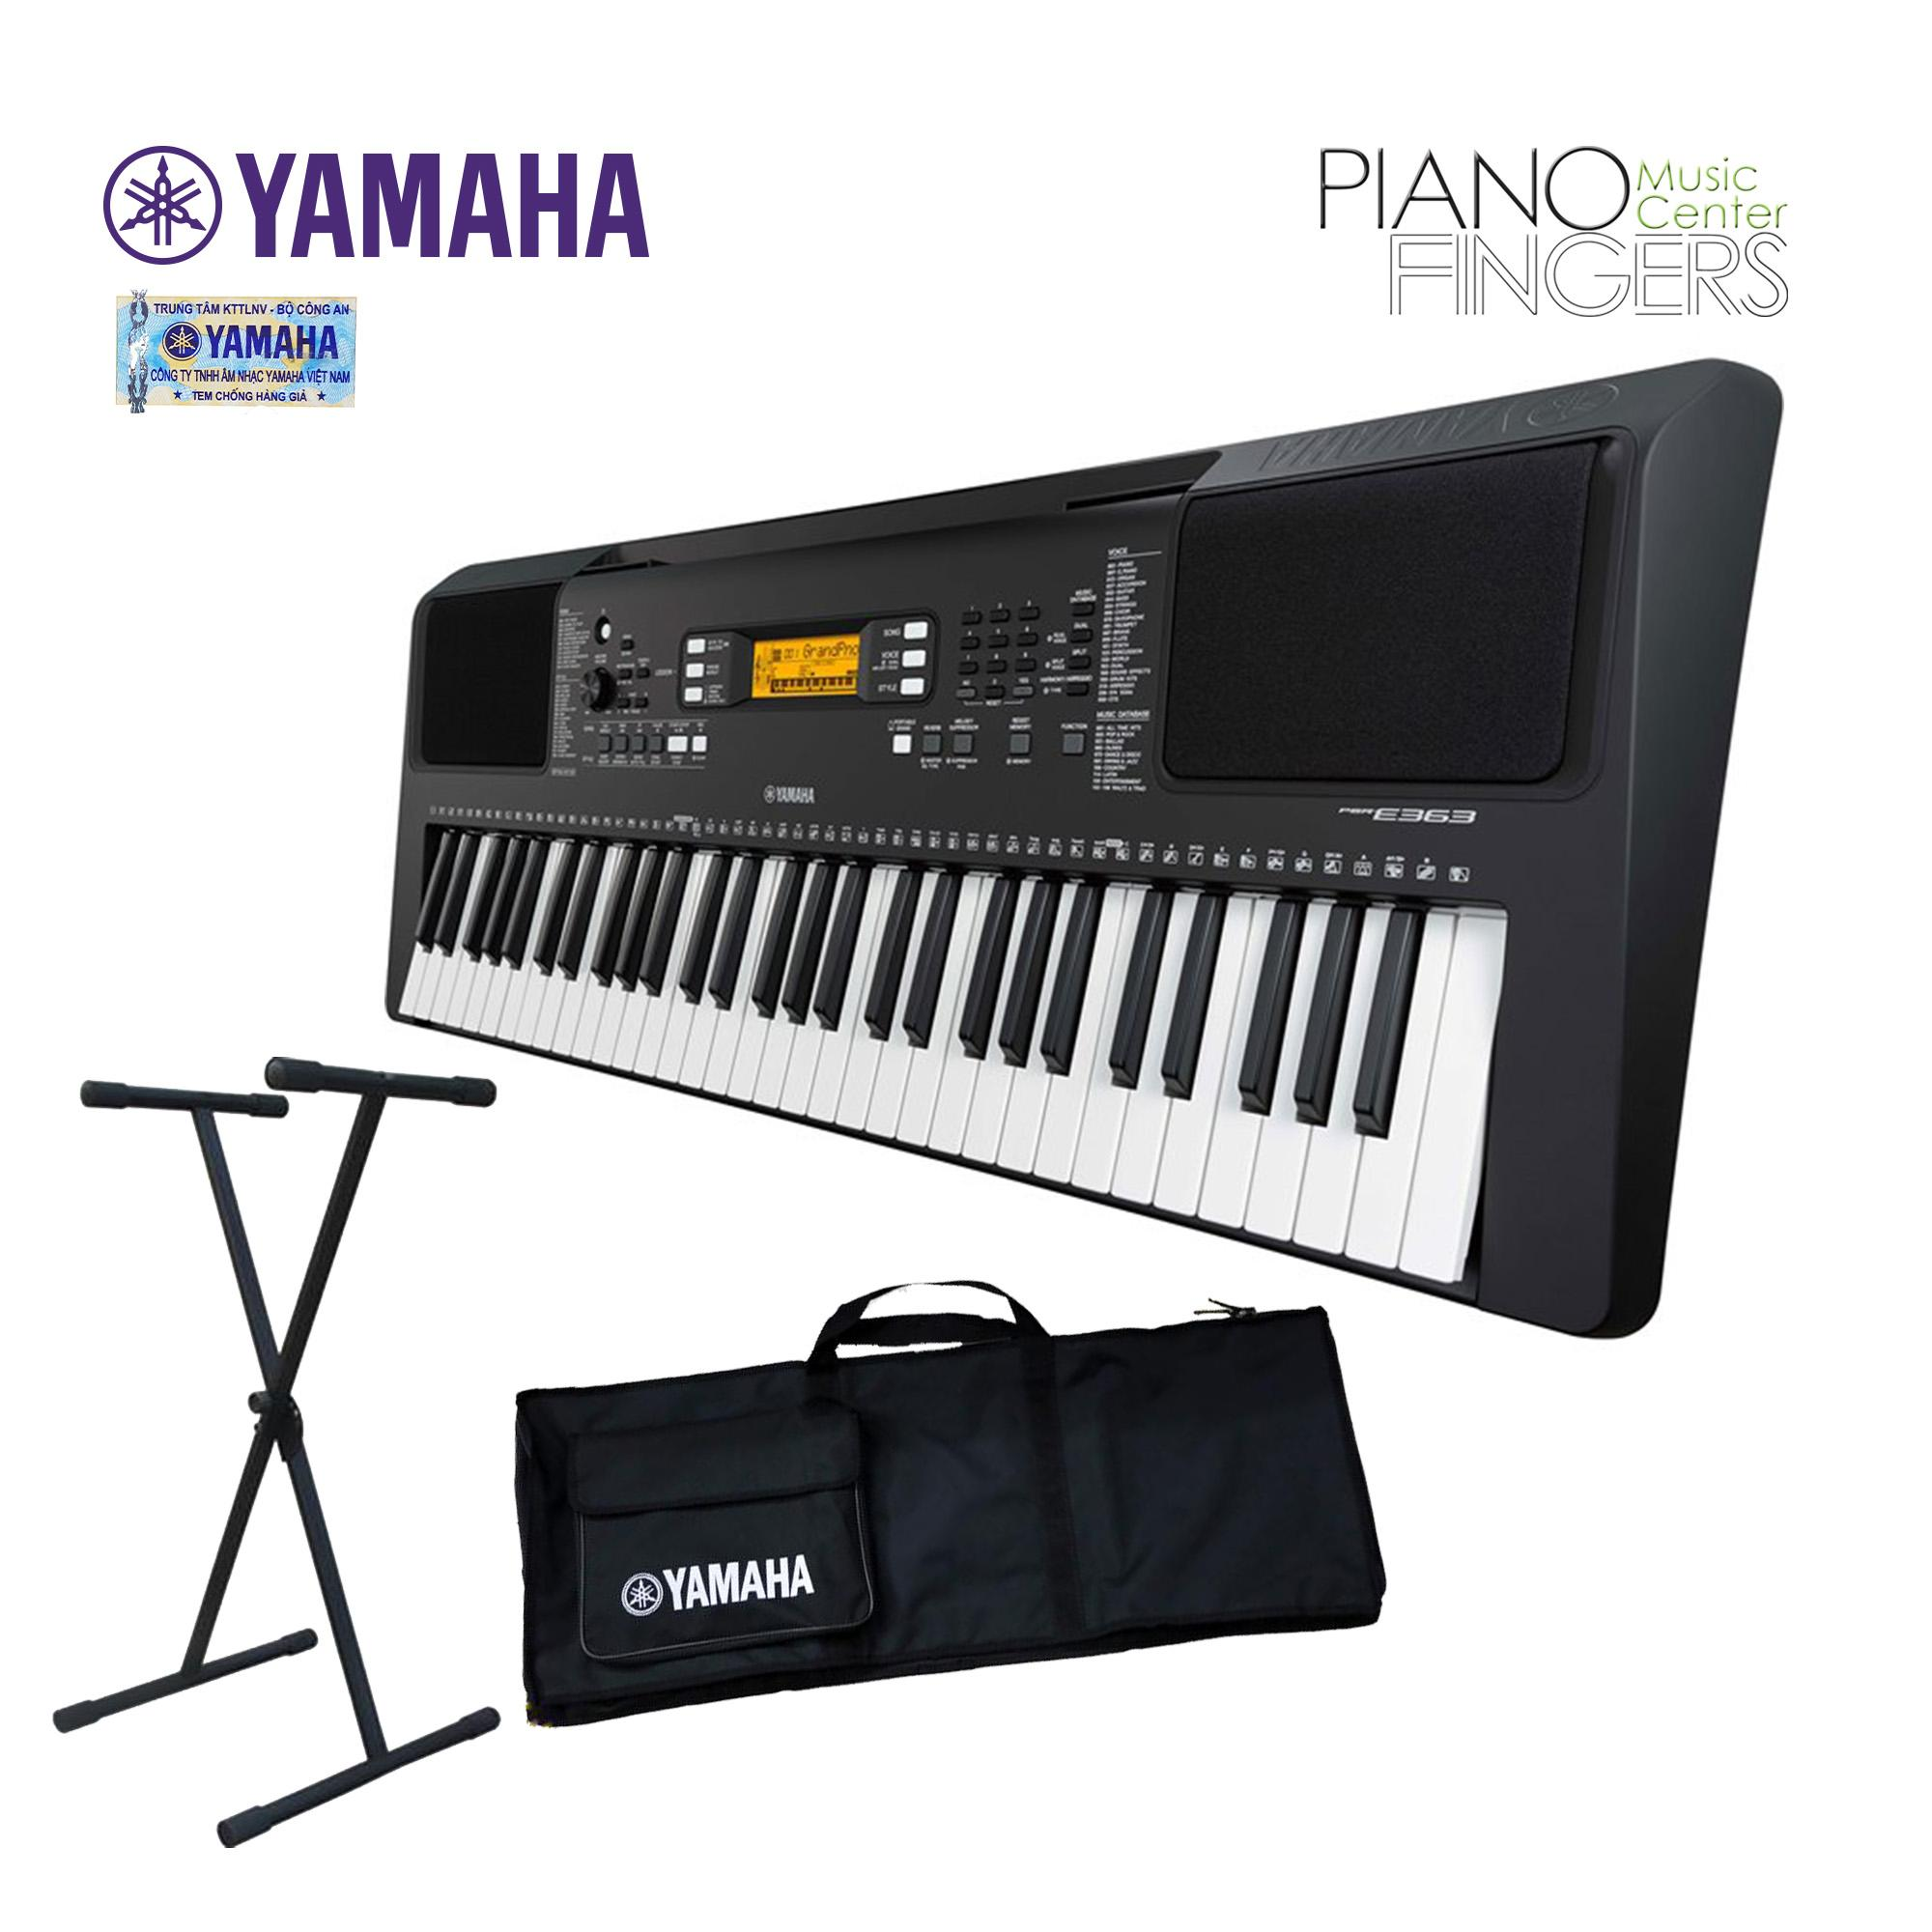 Đàn organ Yamaha PSR-E363+Chân+Bao - Piano Fingers